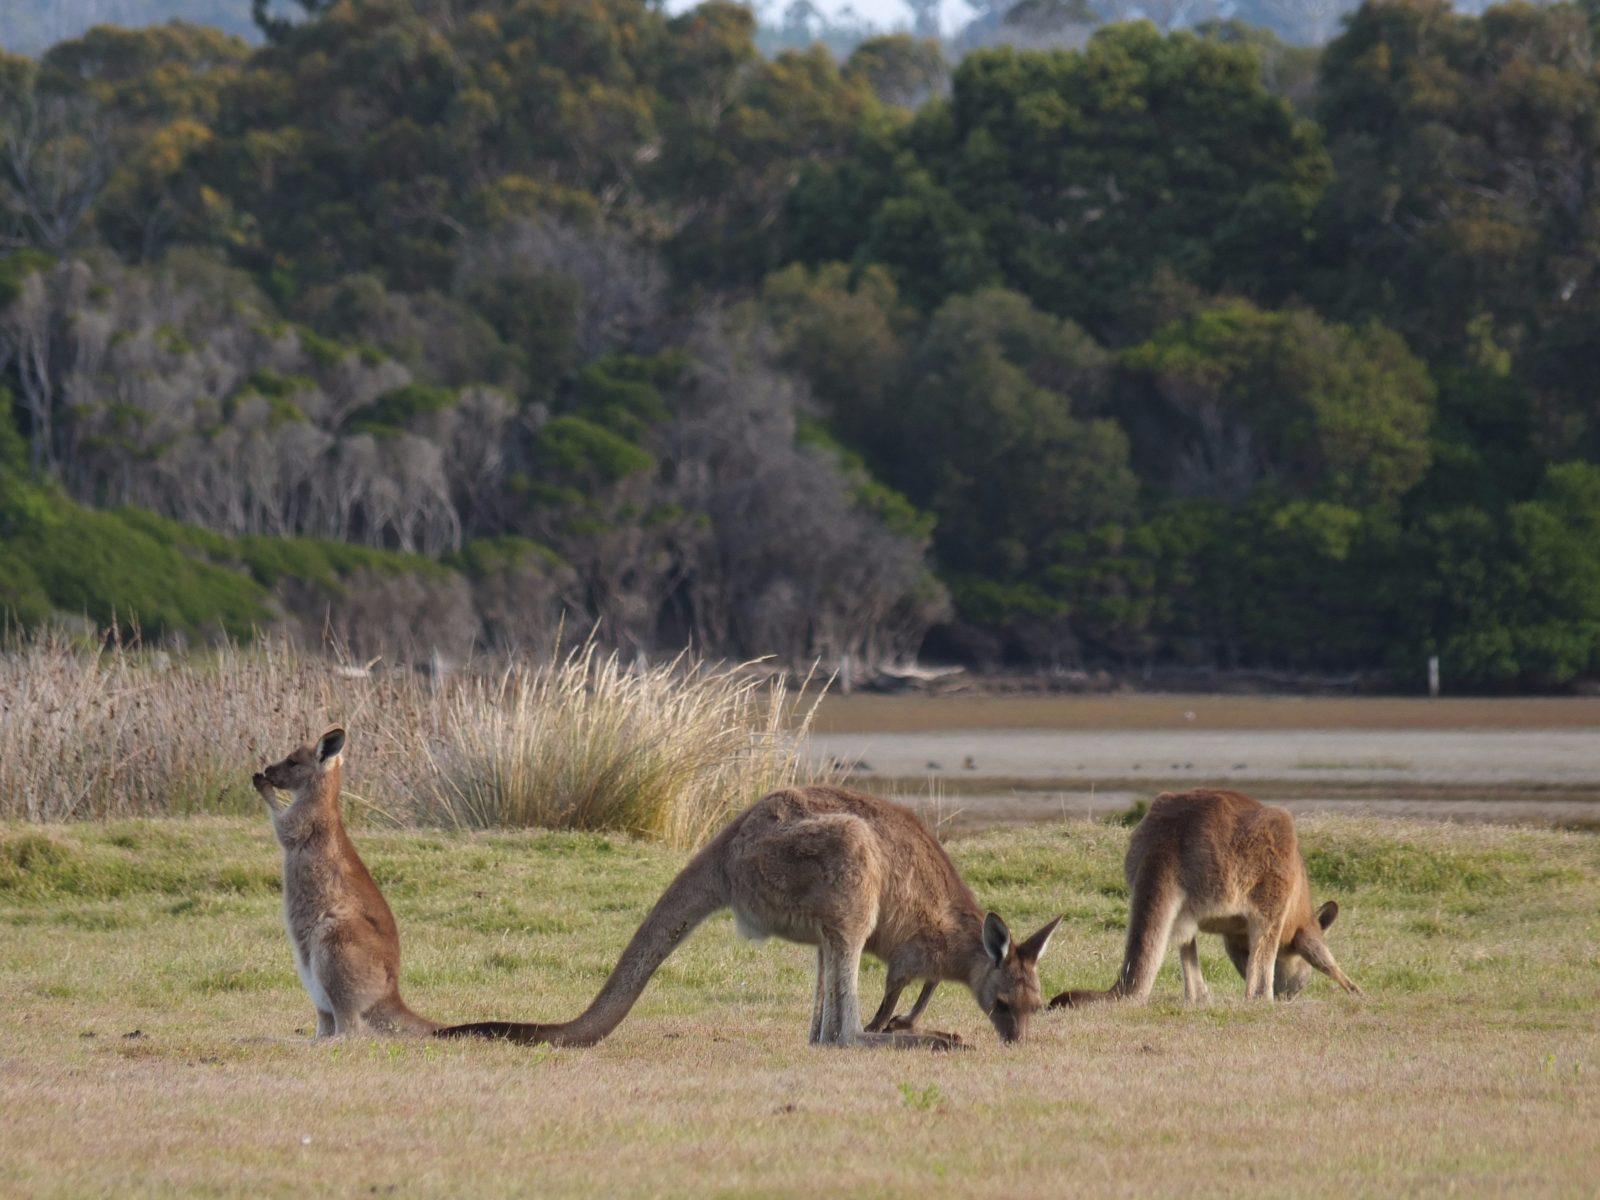 Kangaroos in the Narawntapu National Park